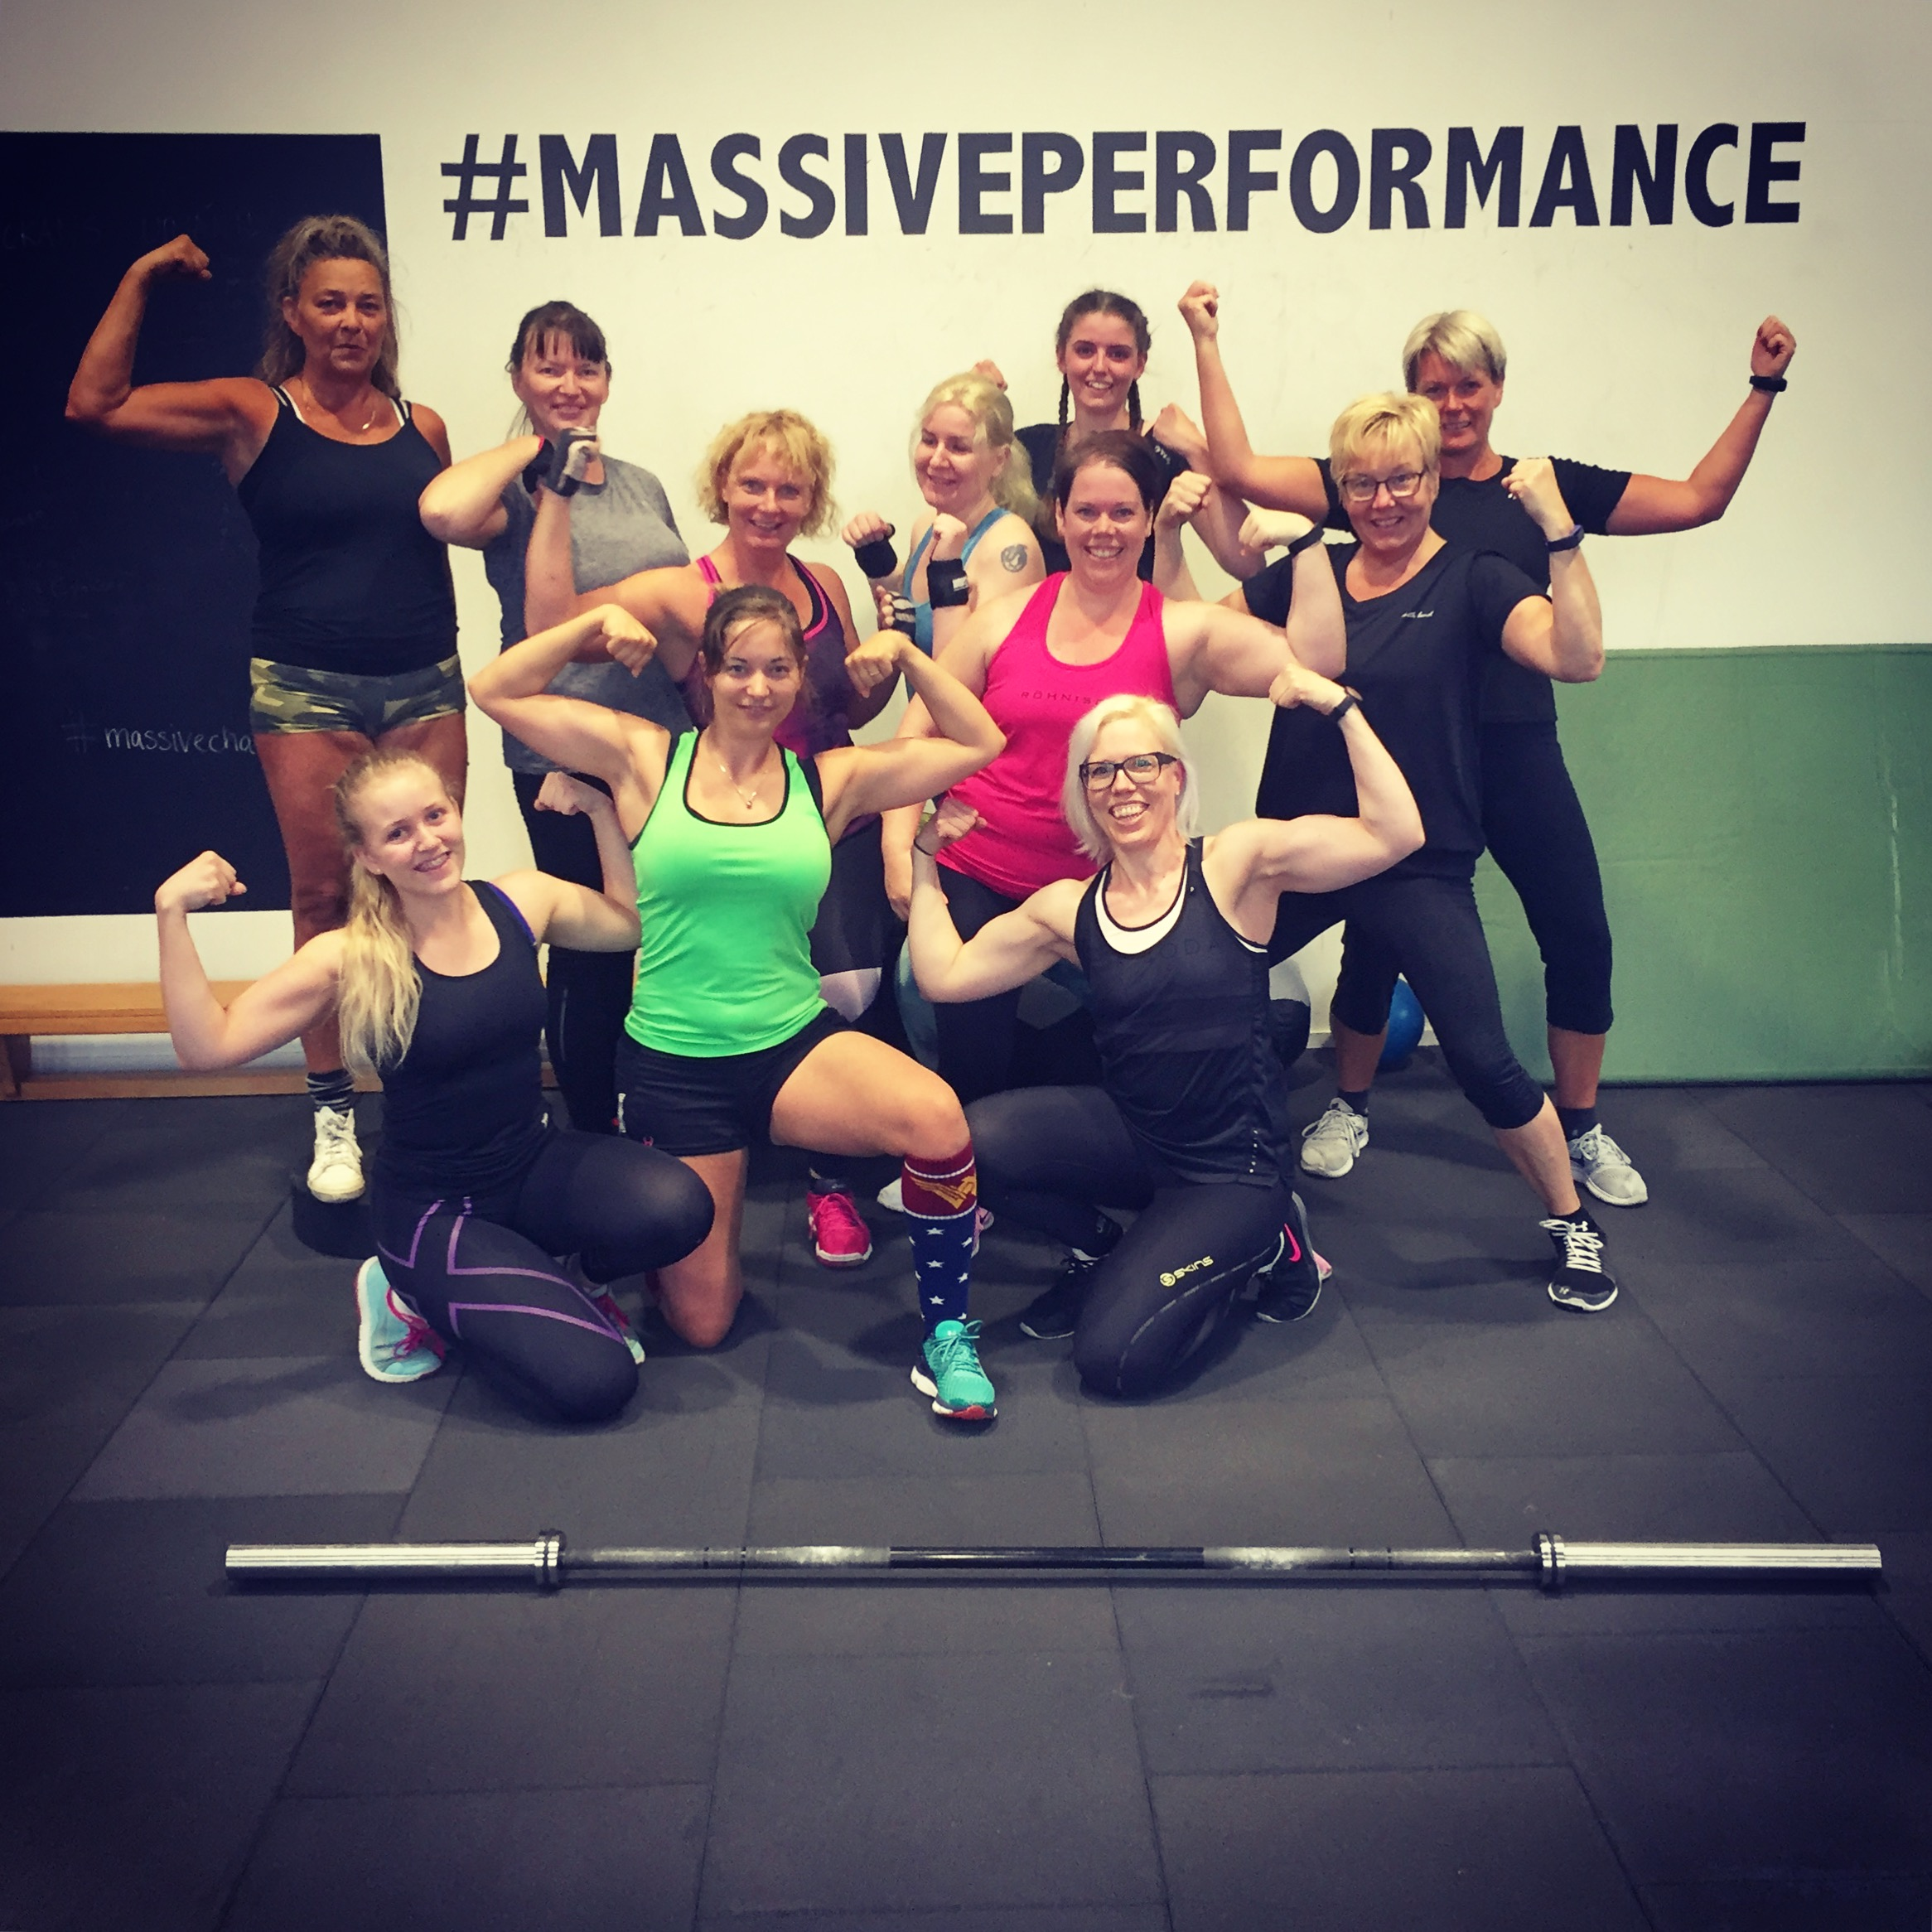 Barbelles skivstång biceps gruppträning pass Massive Performance hashtag.JPG